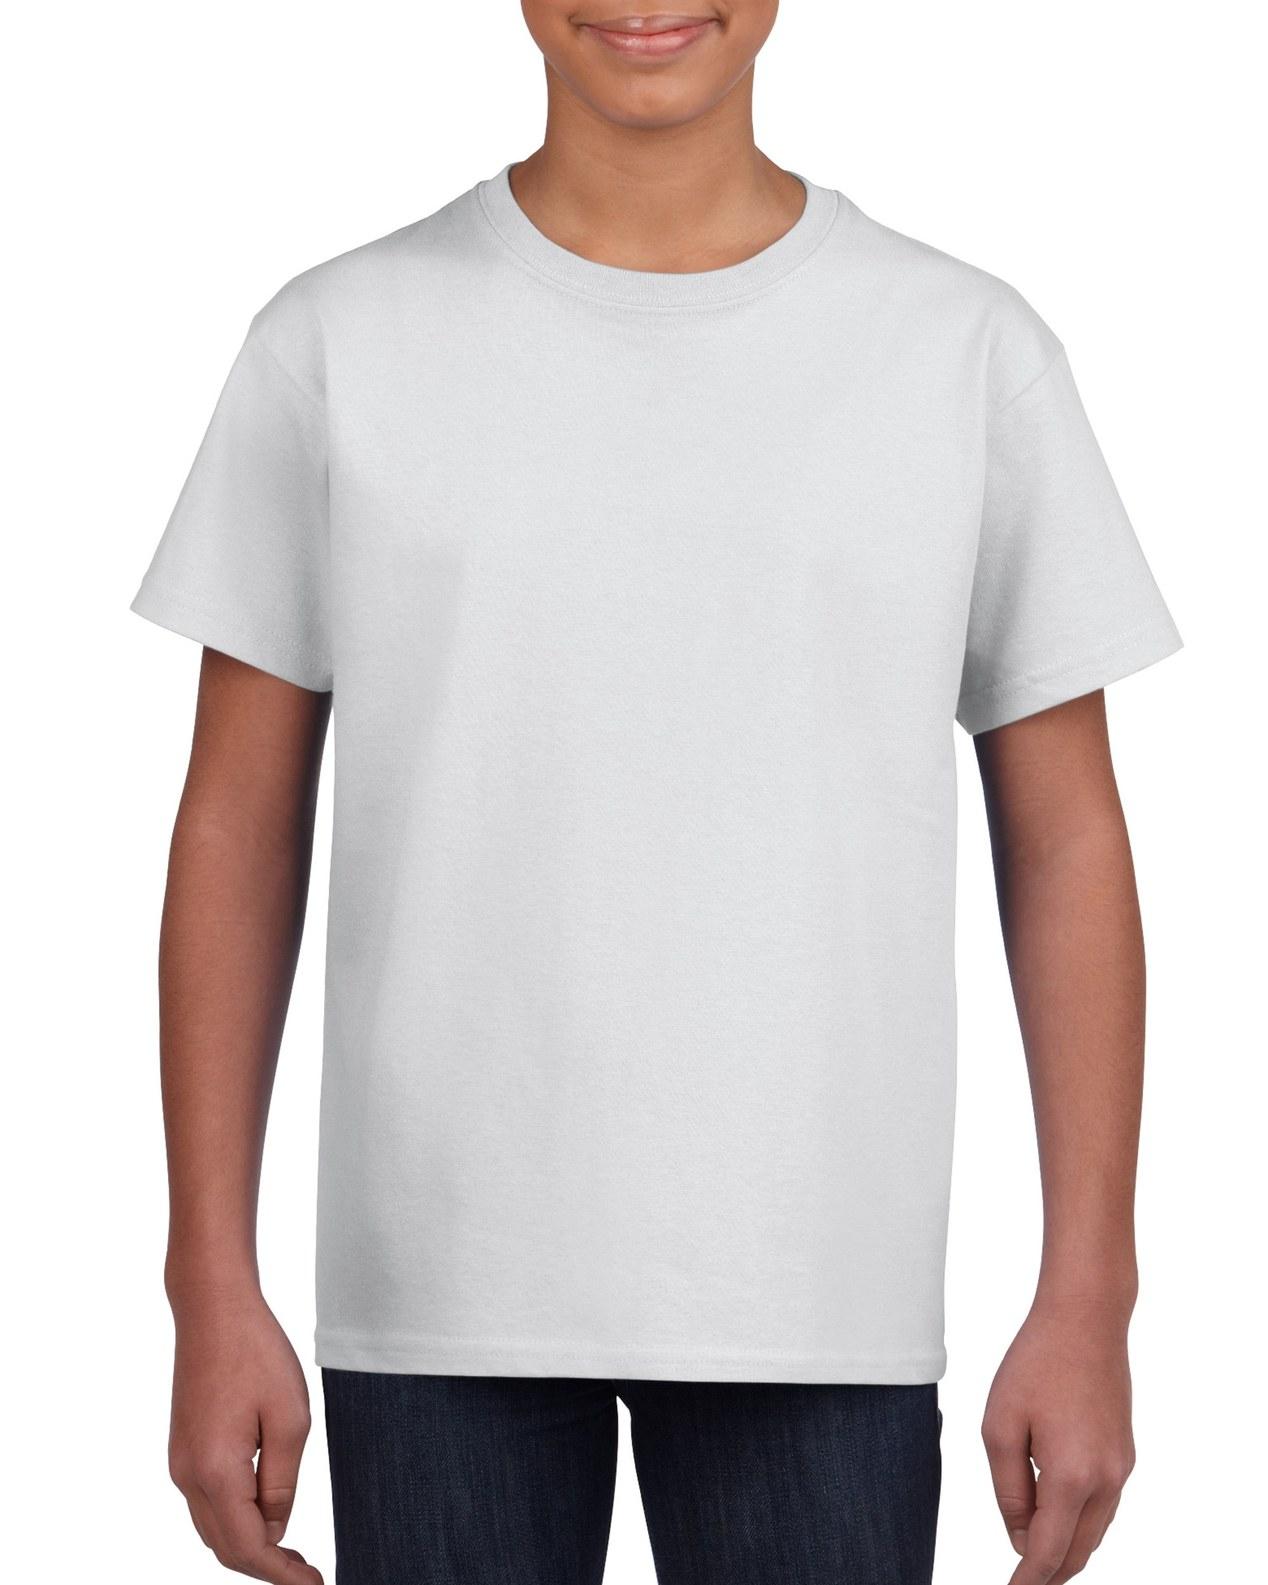 ee3cf975a T-Shirt Printing Canada | Coastal Reign